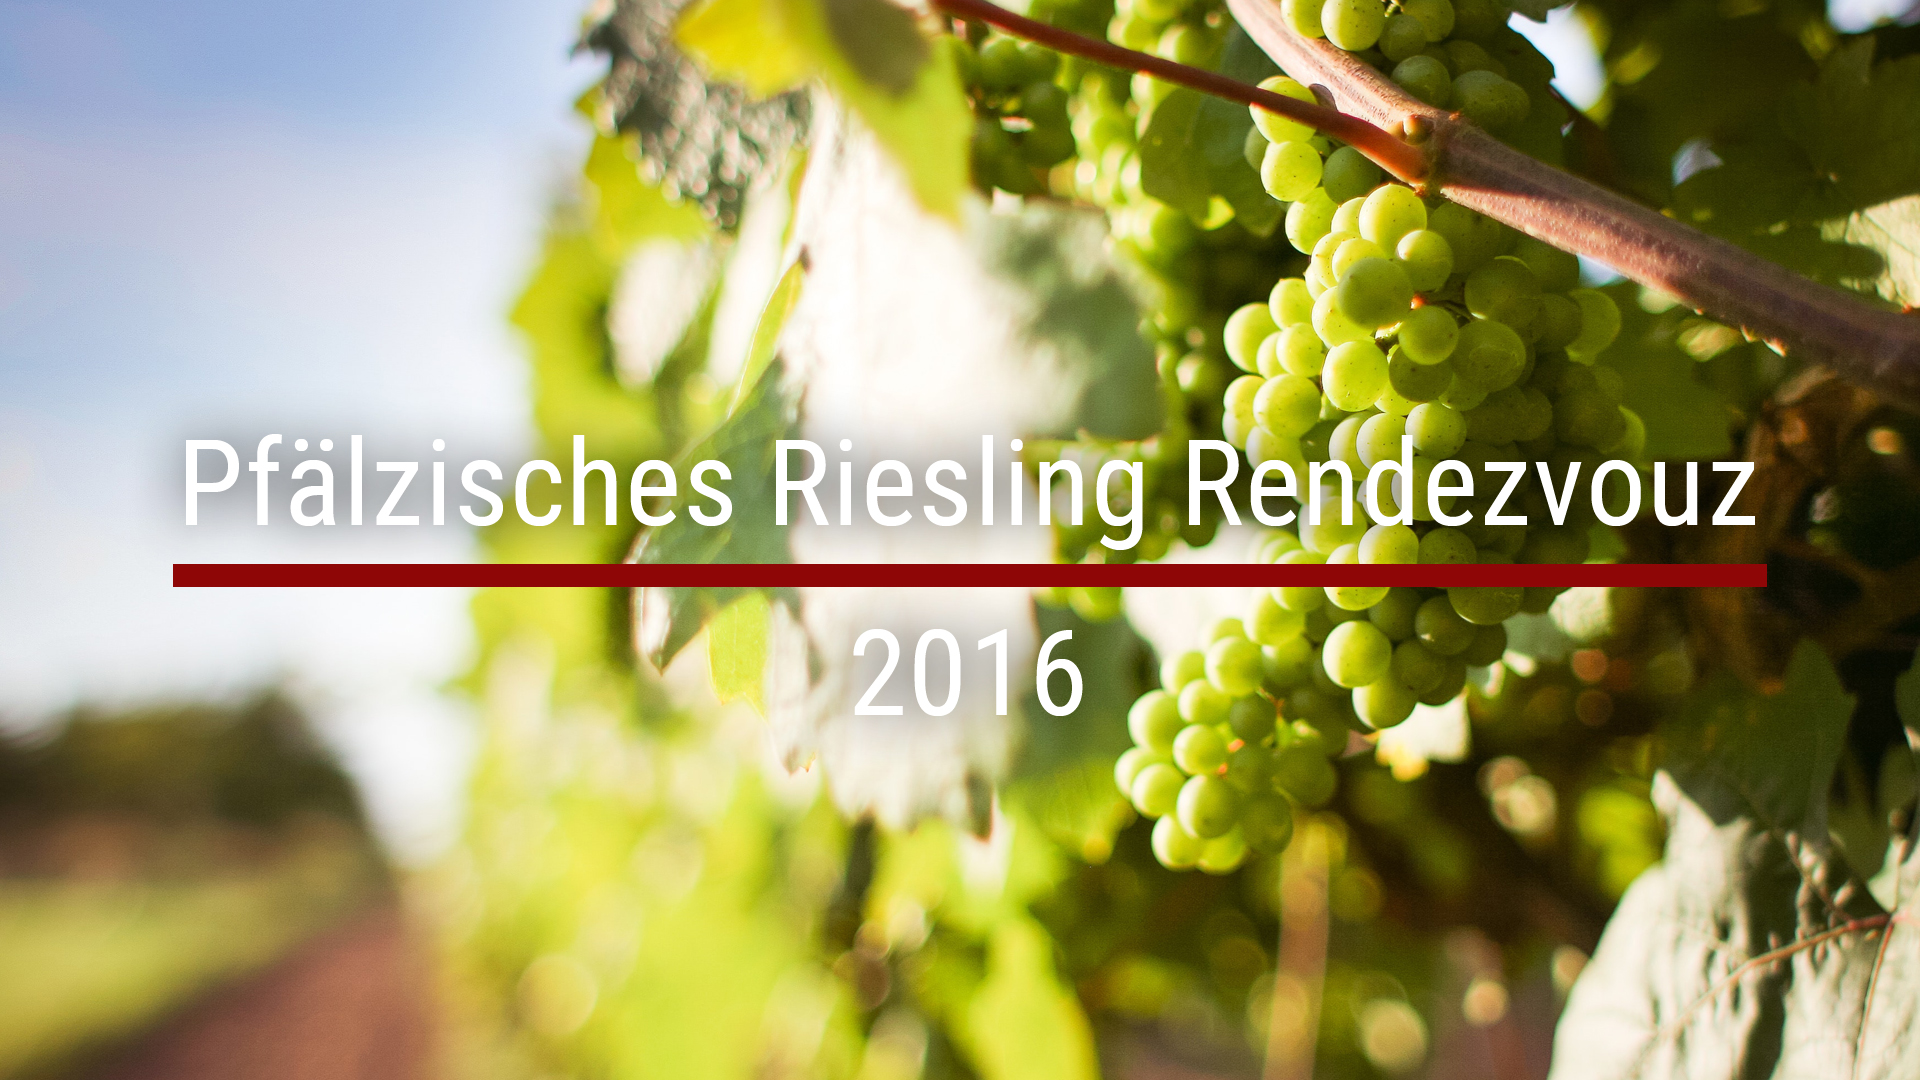 Pfälzisches Riesling Rendezvouz 2016